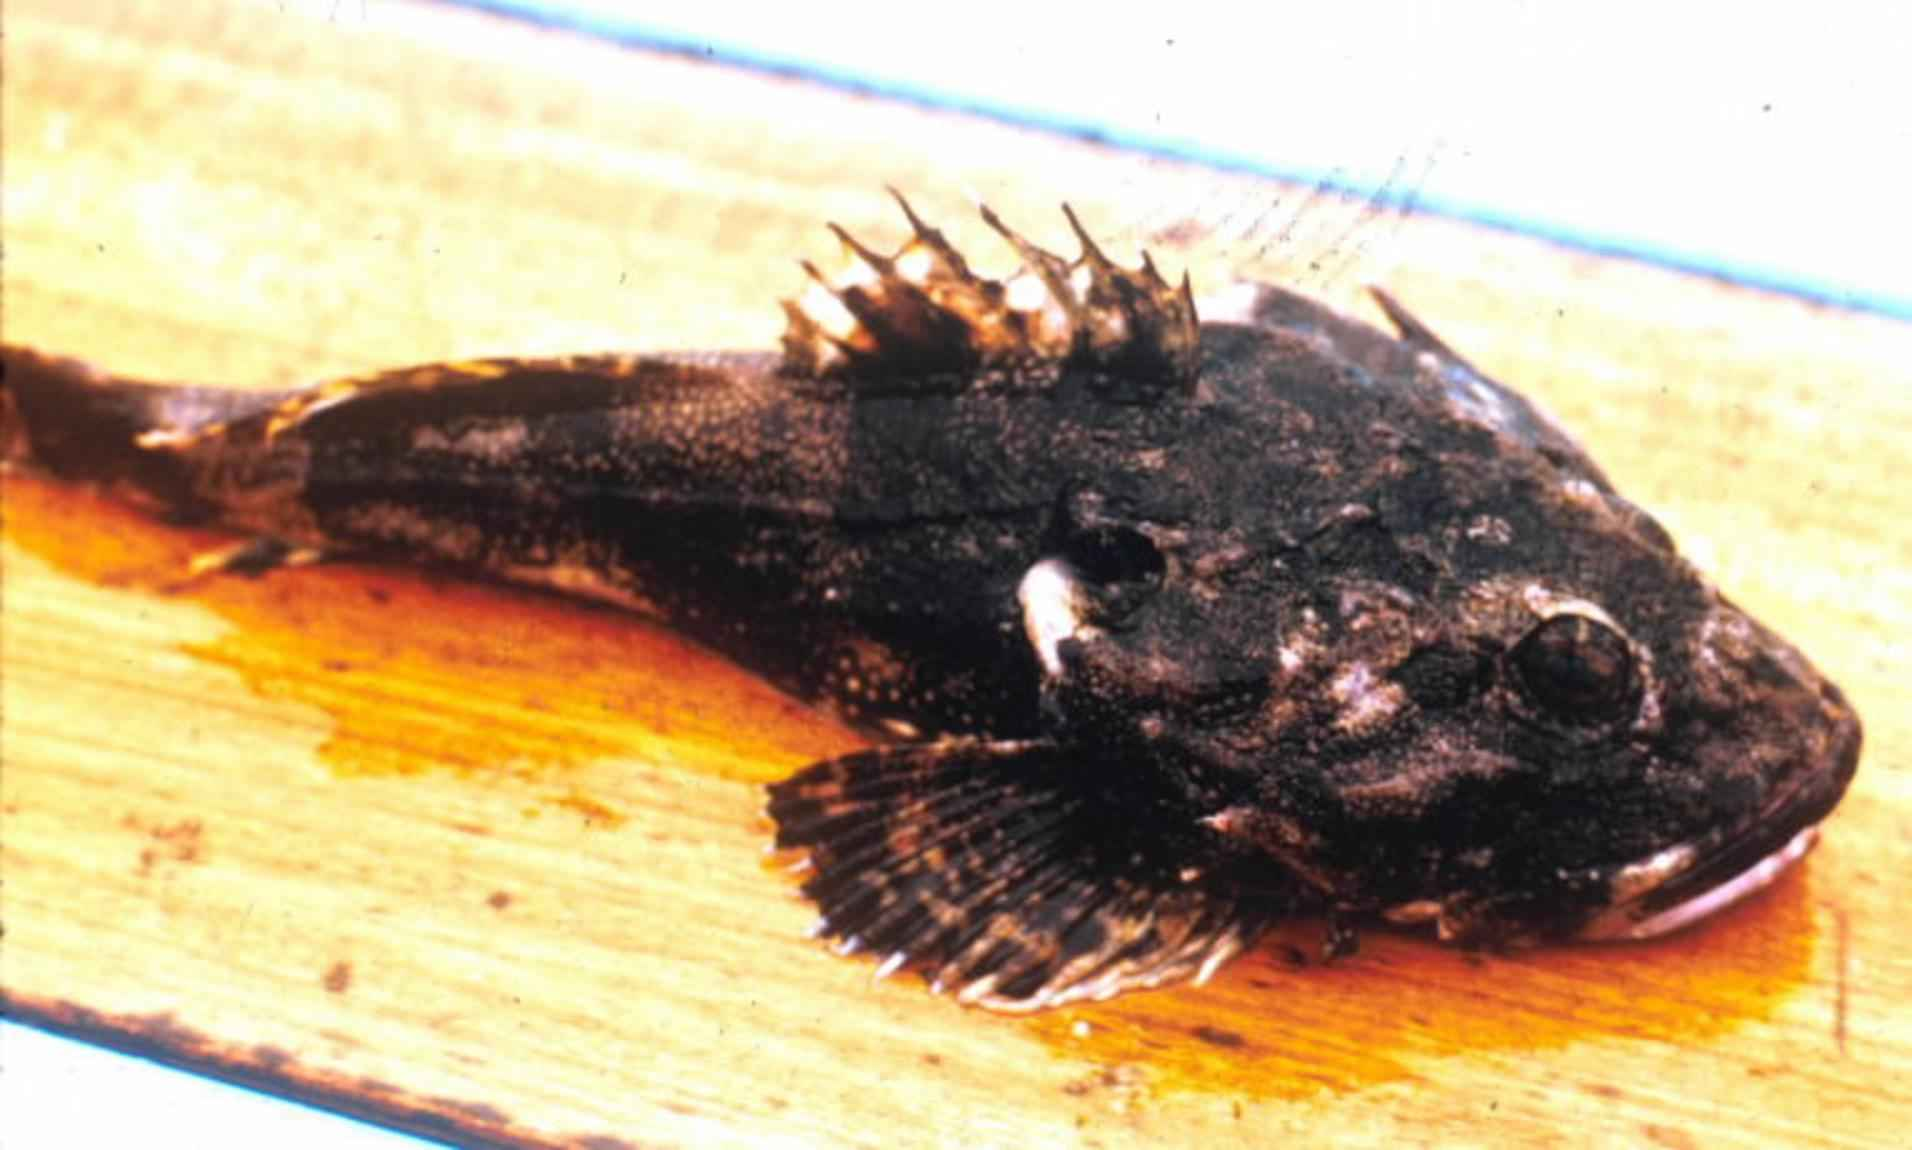 File:Great sculpin fish close up head.jpg - Wikimedia Commons